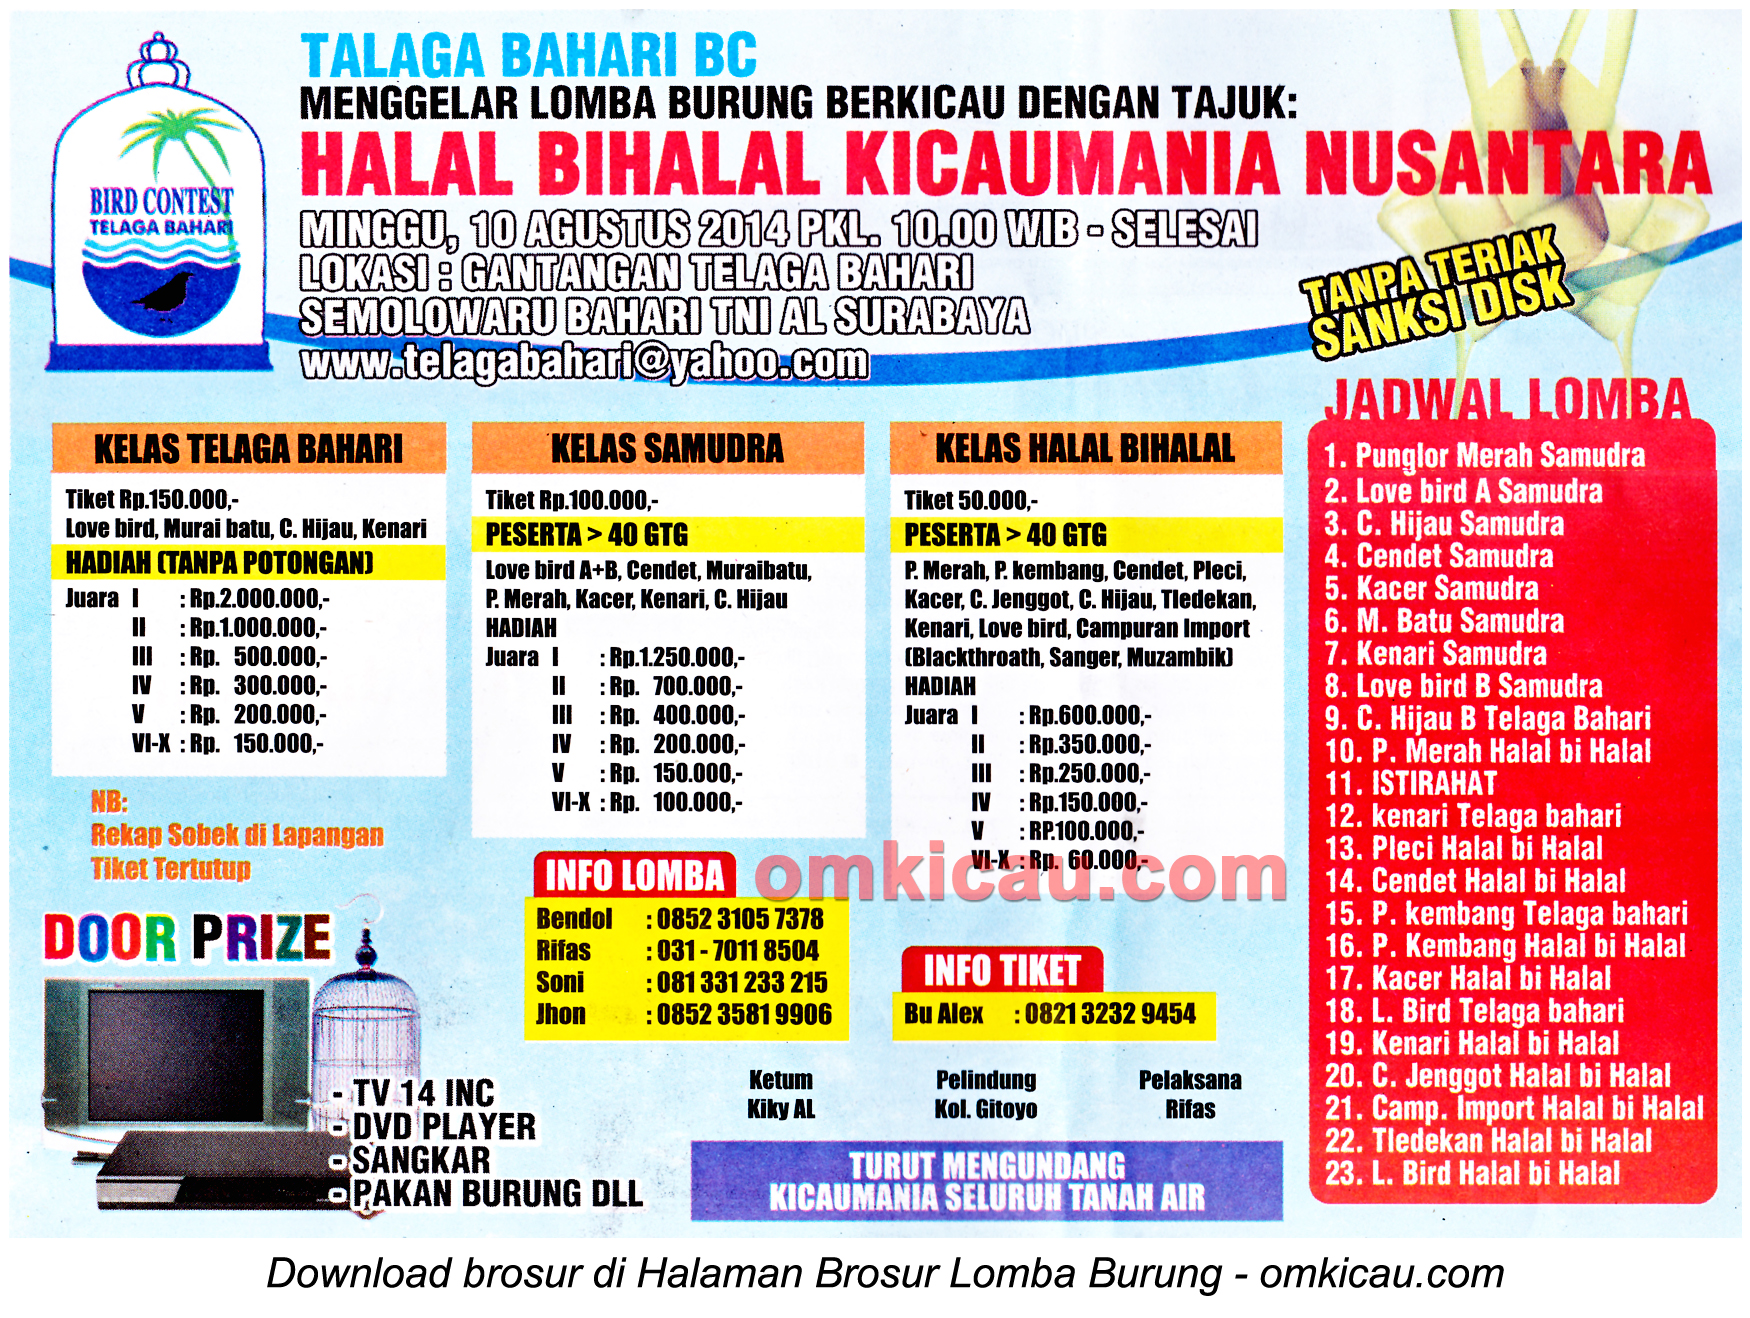 Brosur Lomba Burung Halal Bihalal Kicaumania Nusantara, Surabaya, 10 Agustus 2014